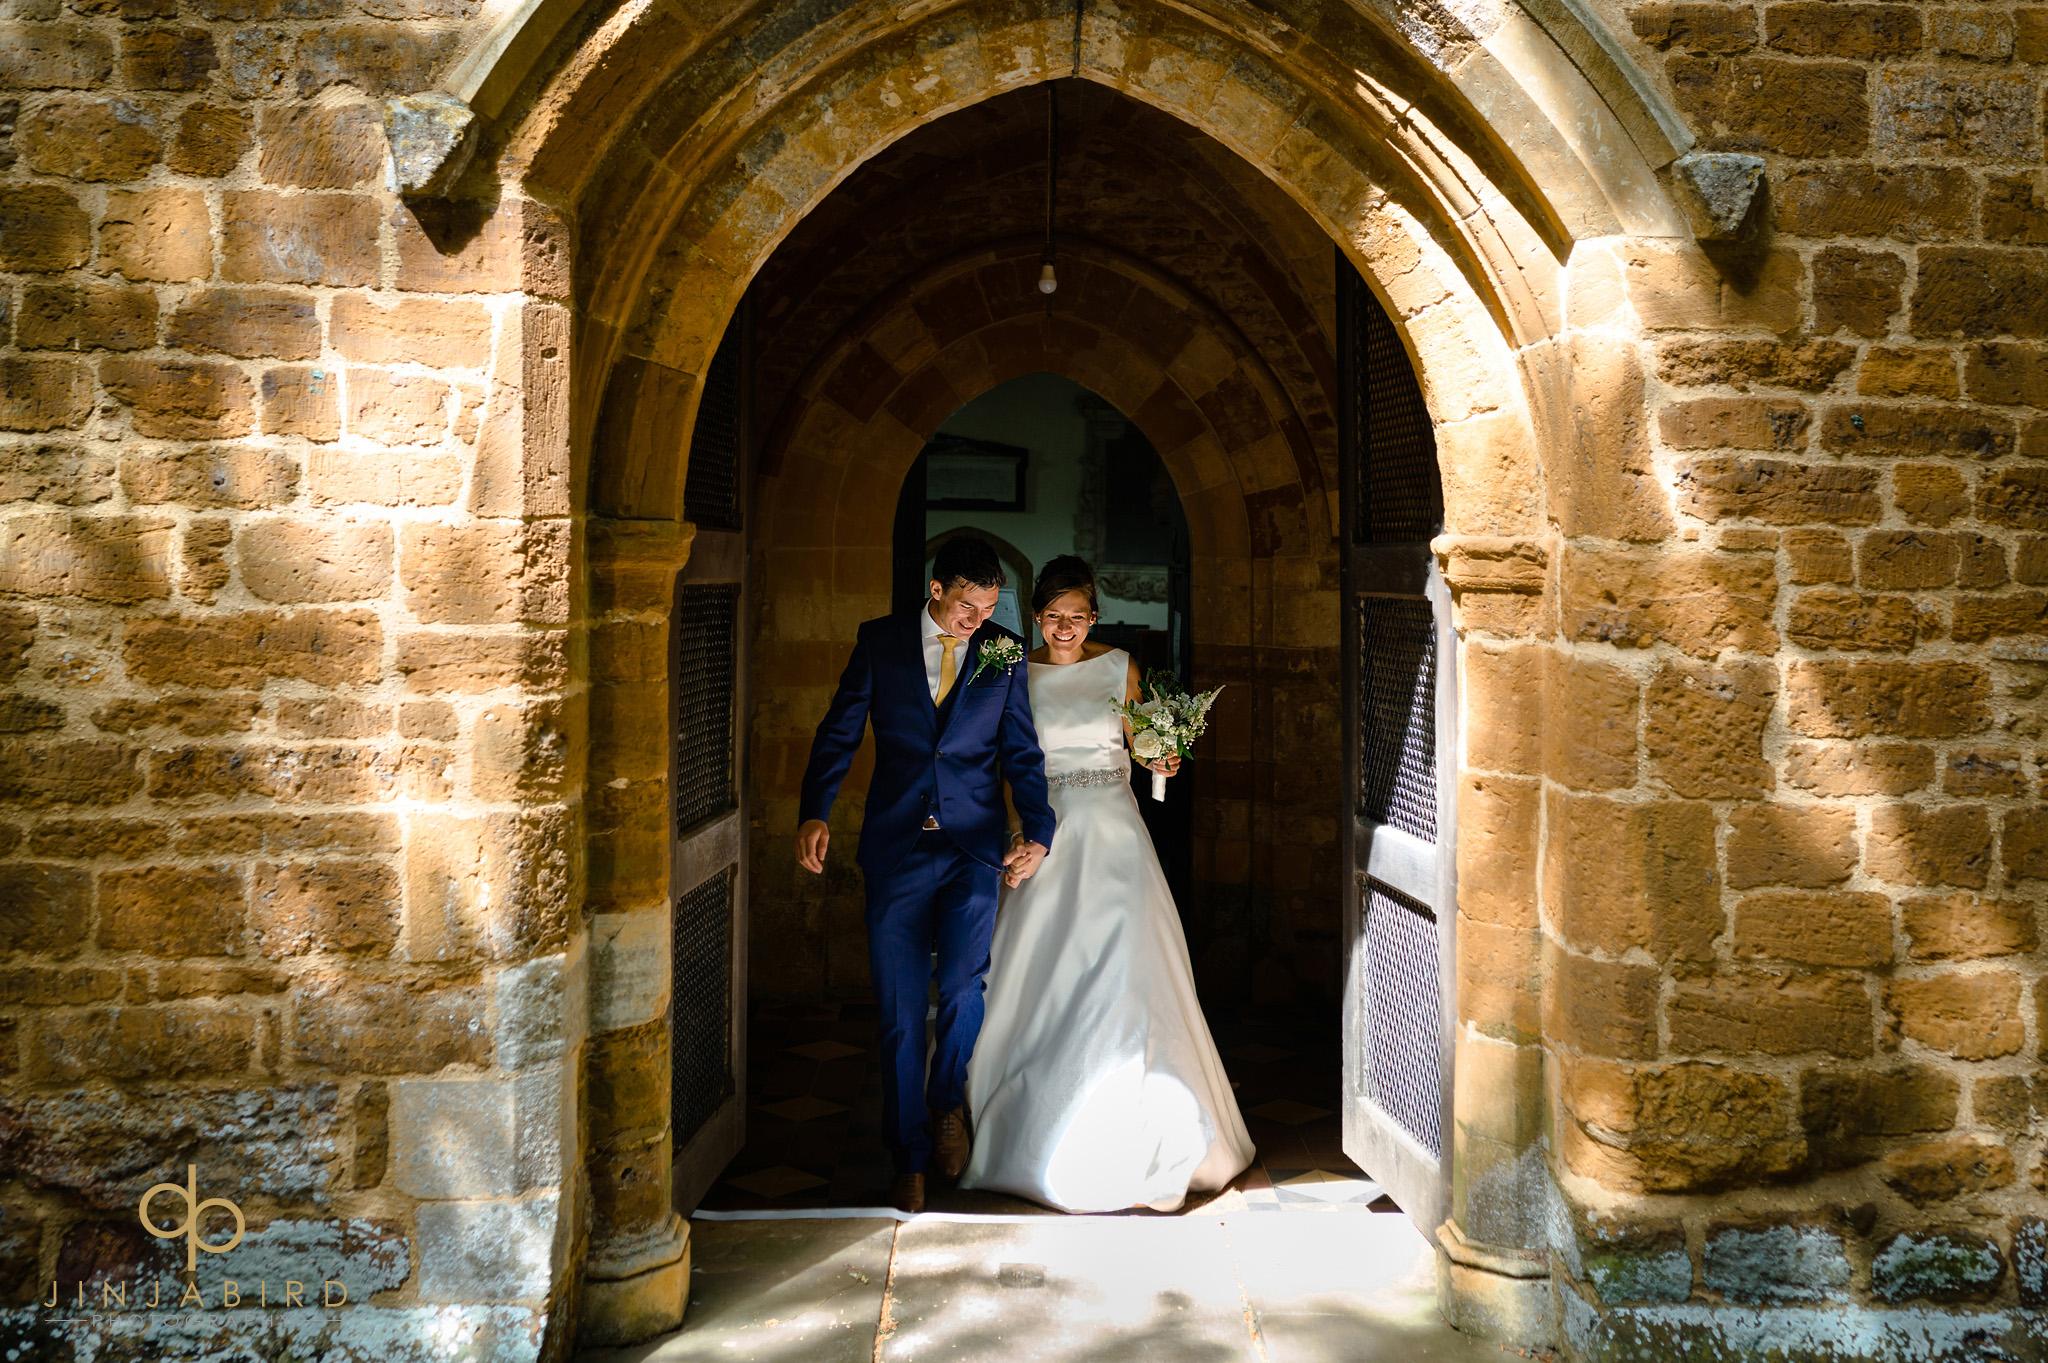 dodford church wedding